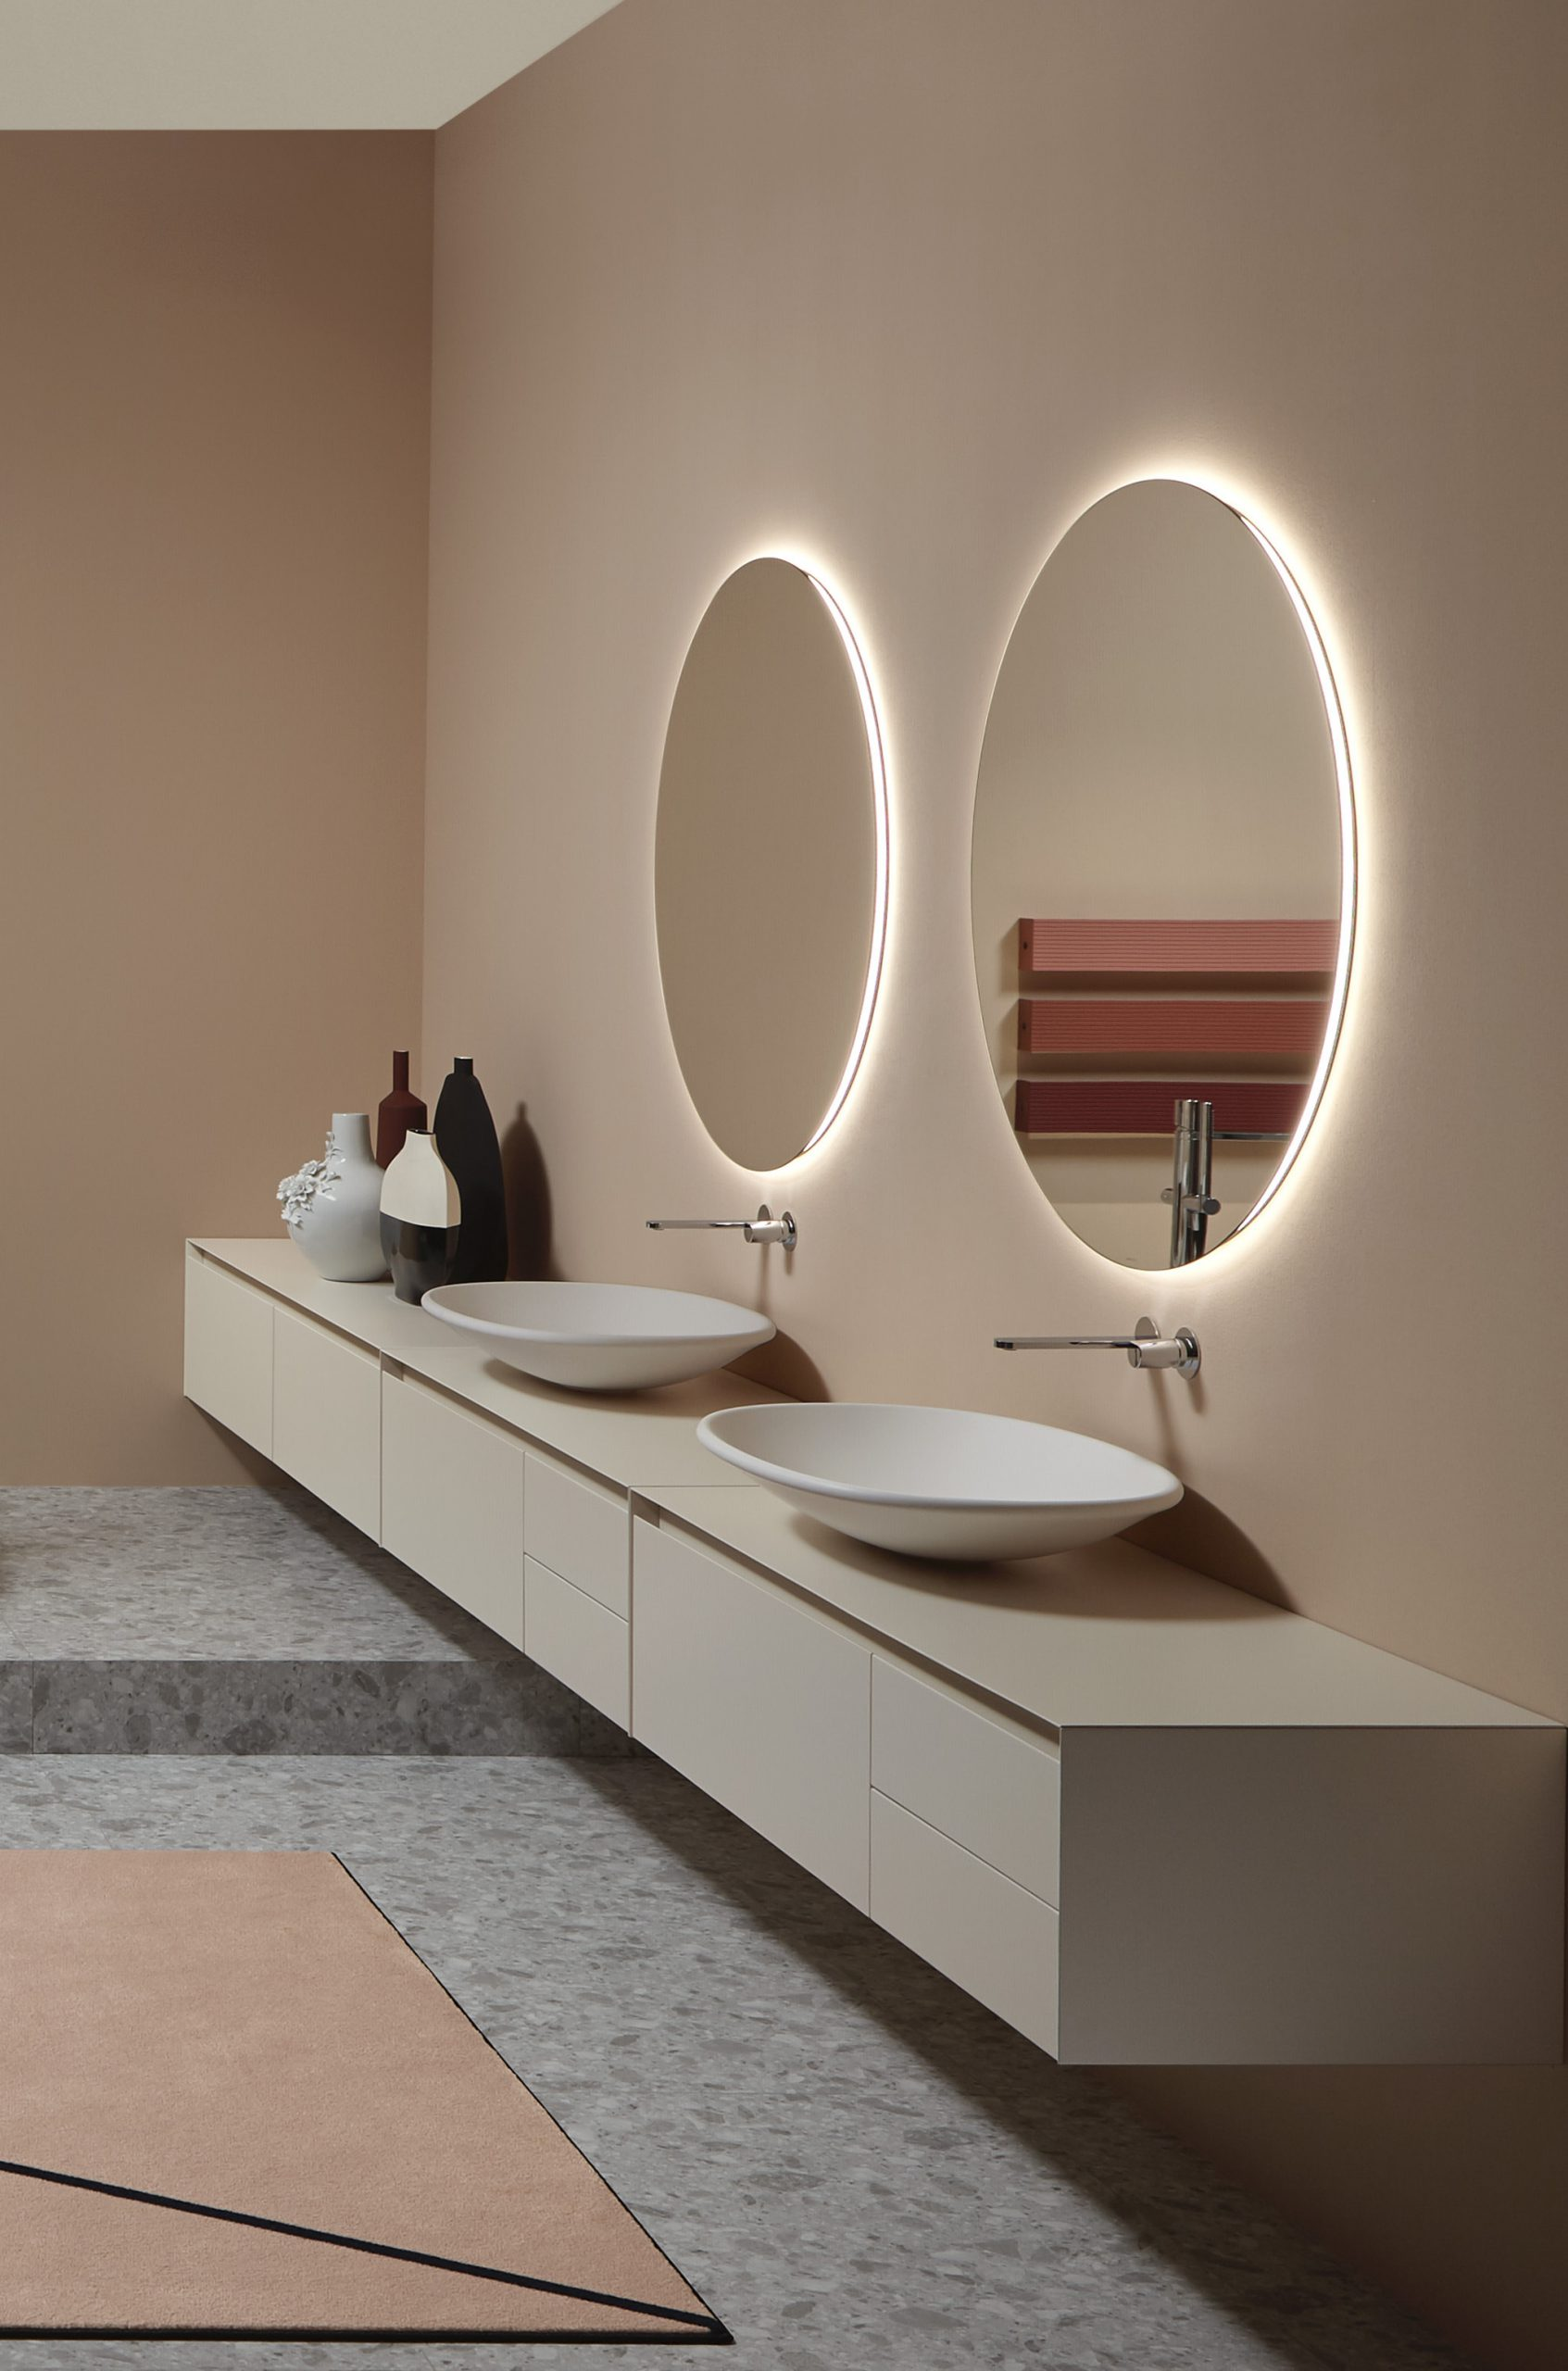 Interior with Rim washbasins by Debiasi Sandri